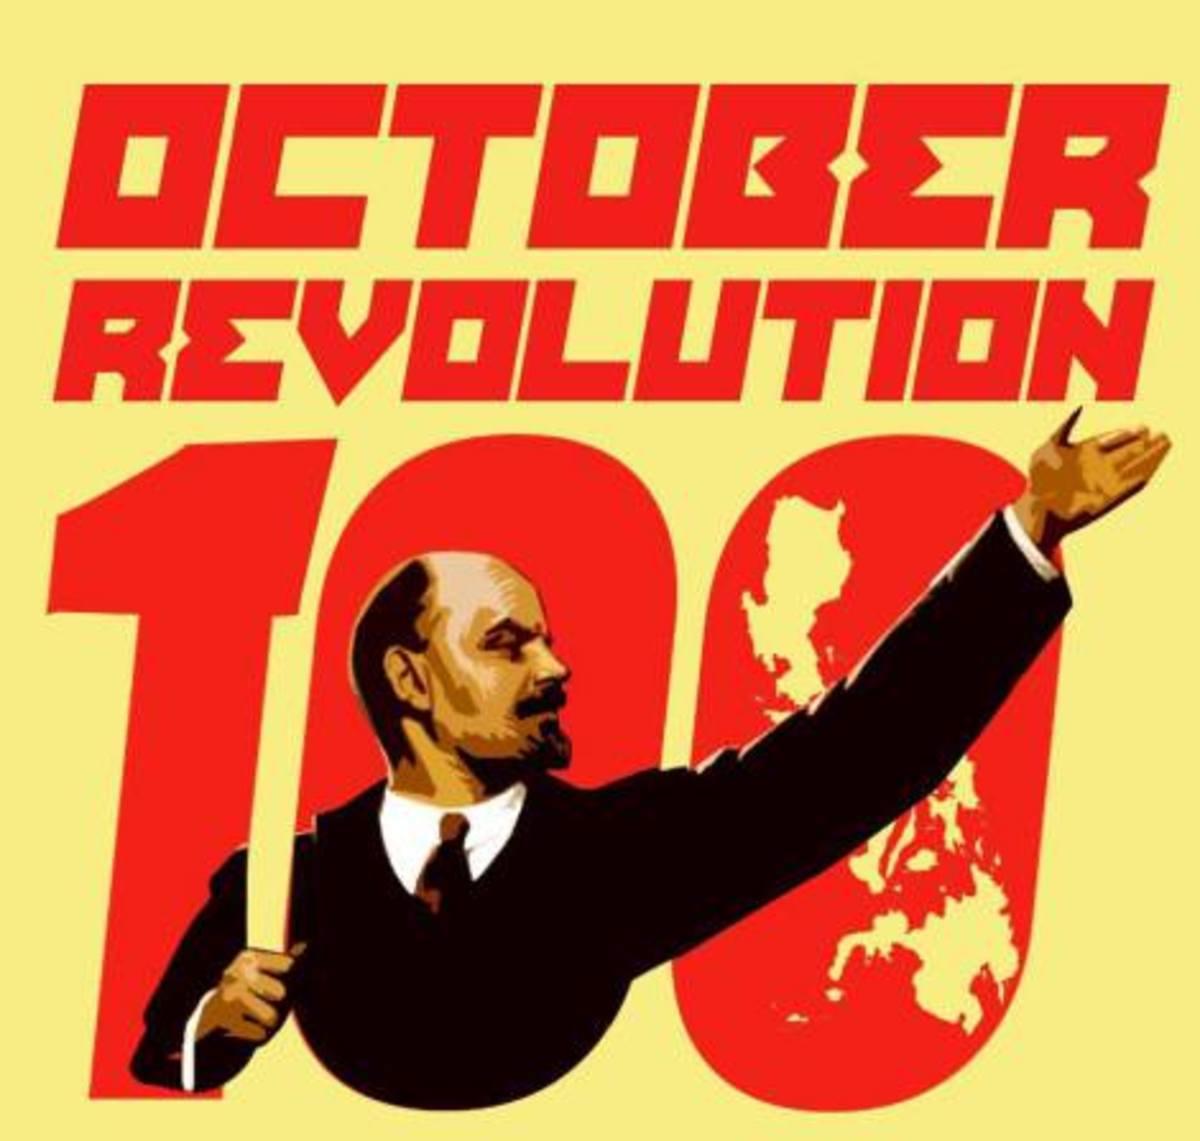 The Russian October Revolution of 1917